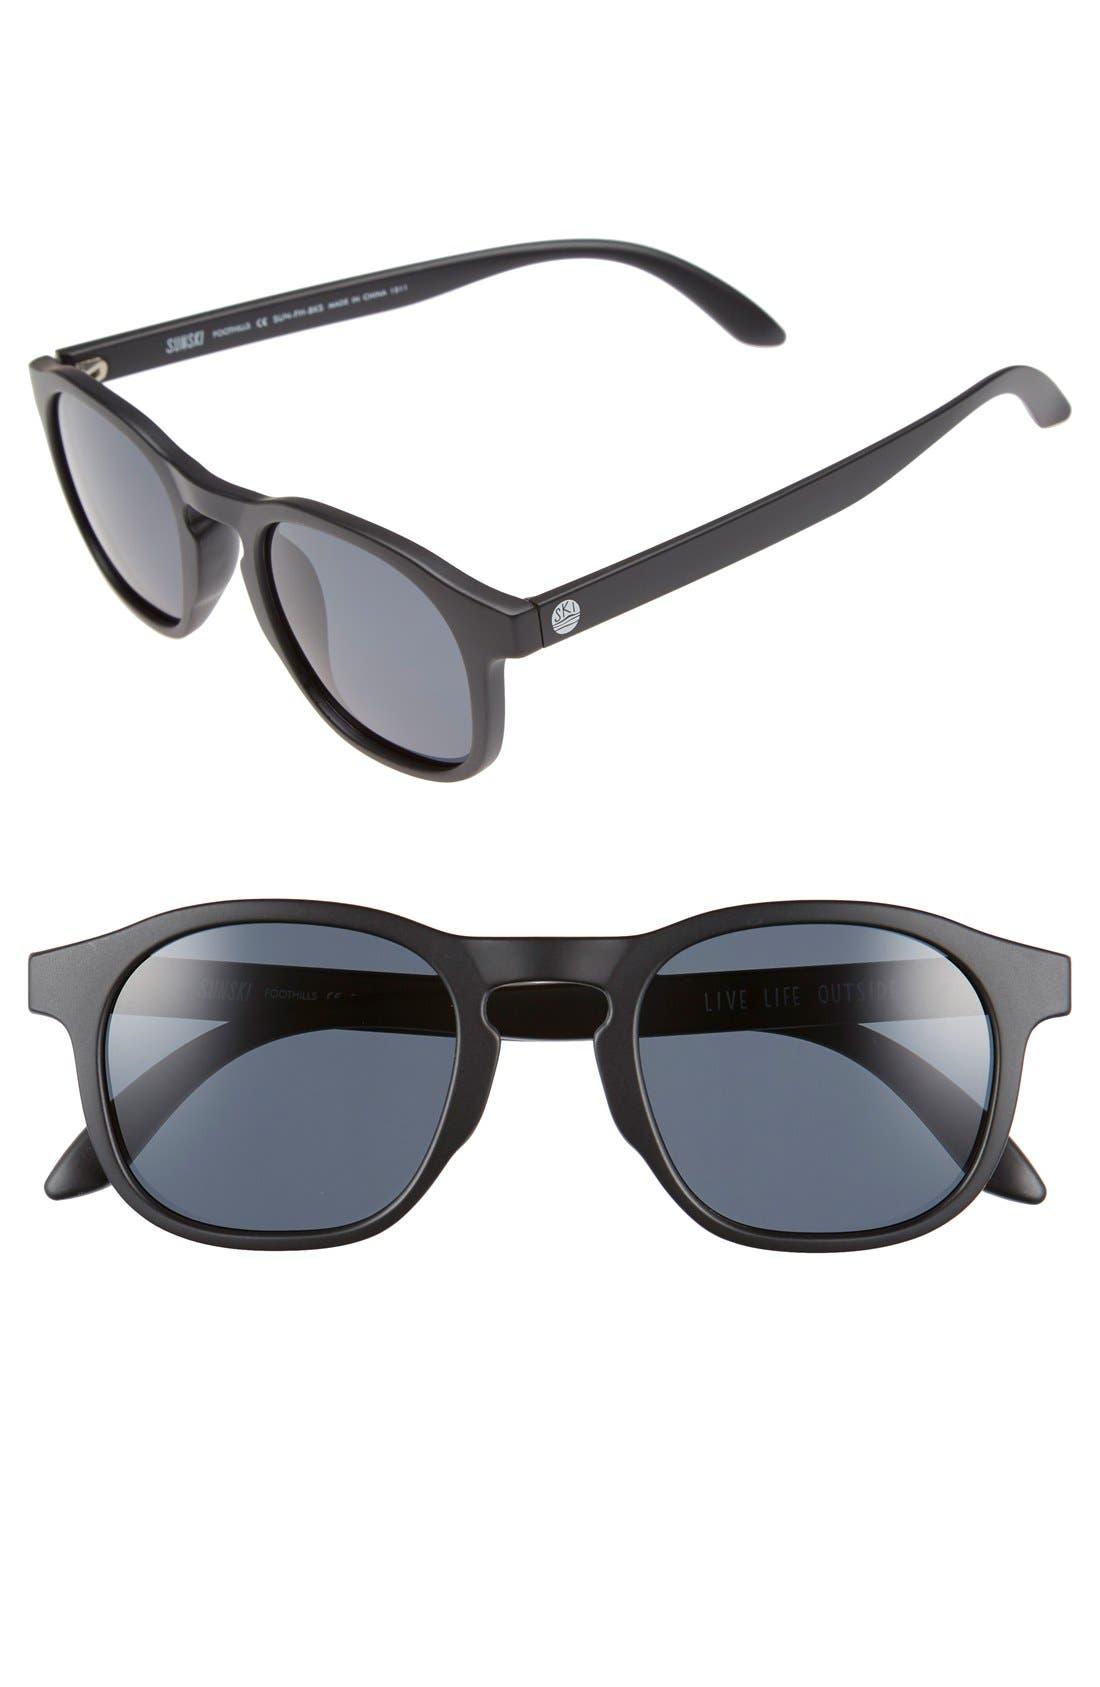 Sunski 'Foothills' 47mm Polarized Retro Sunglasses